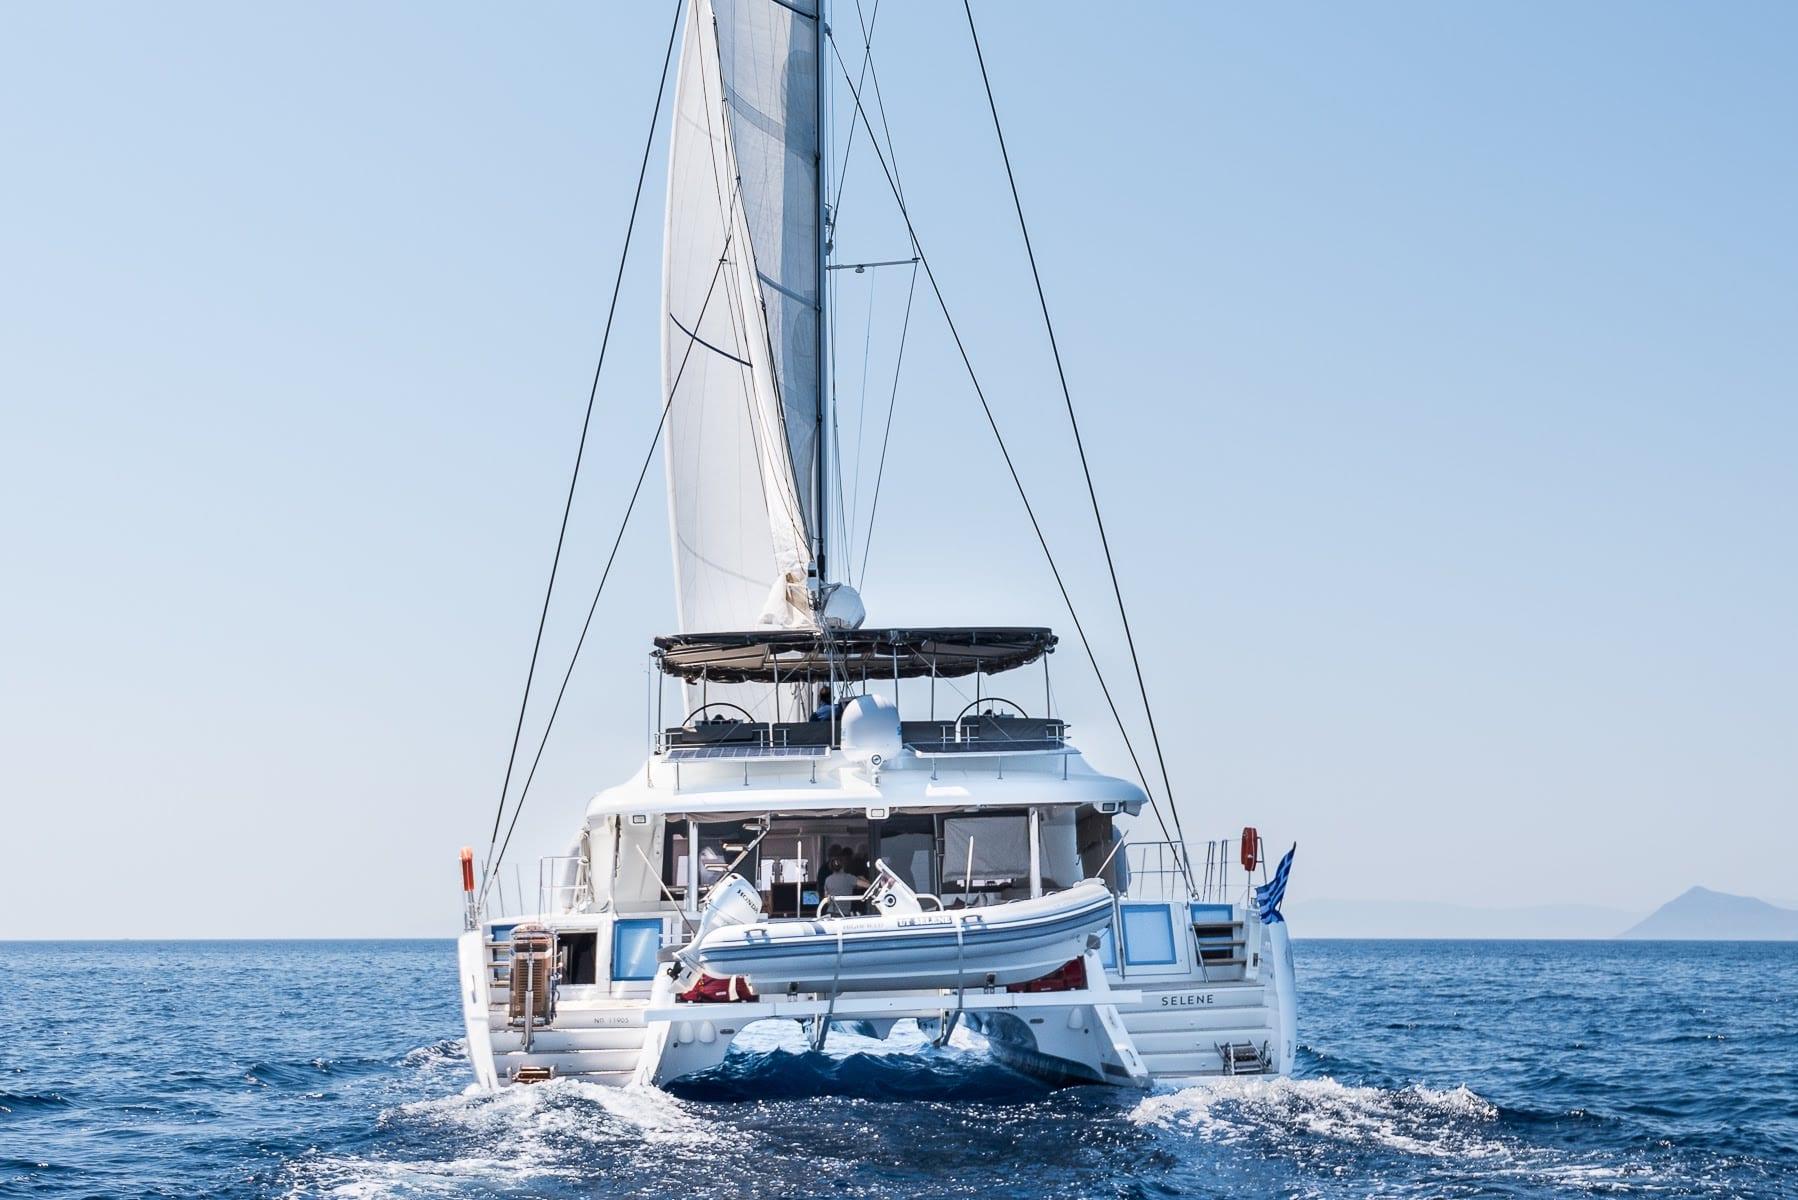 selene catamaran profile (2) -  Valef Yachts Chartering - 1946